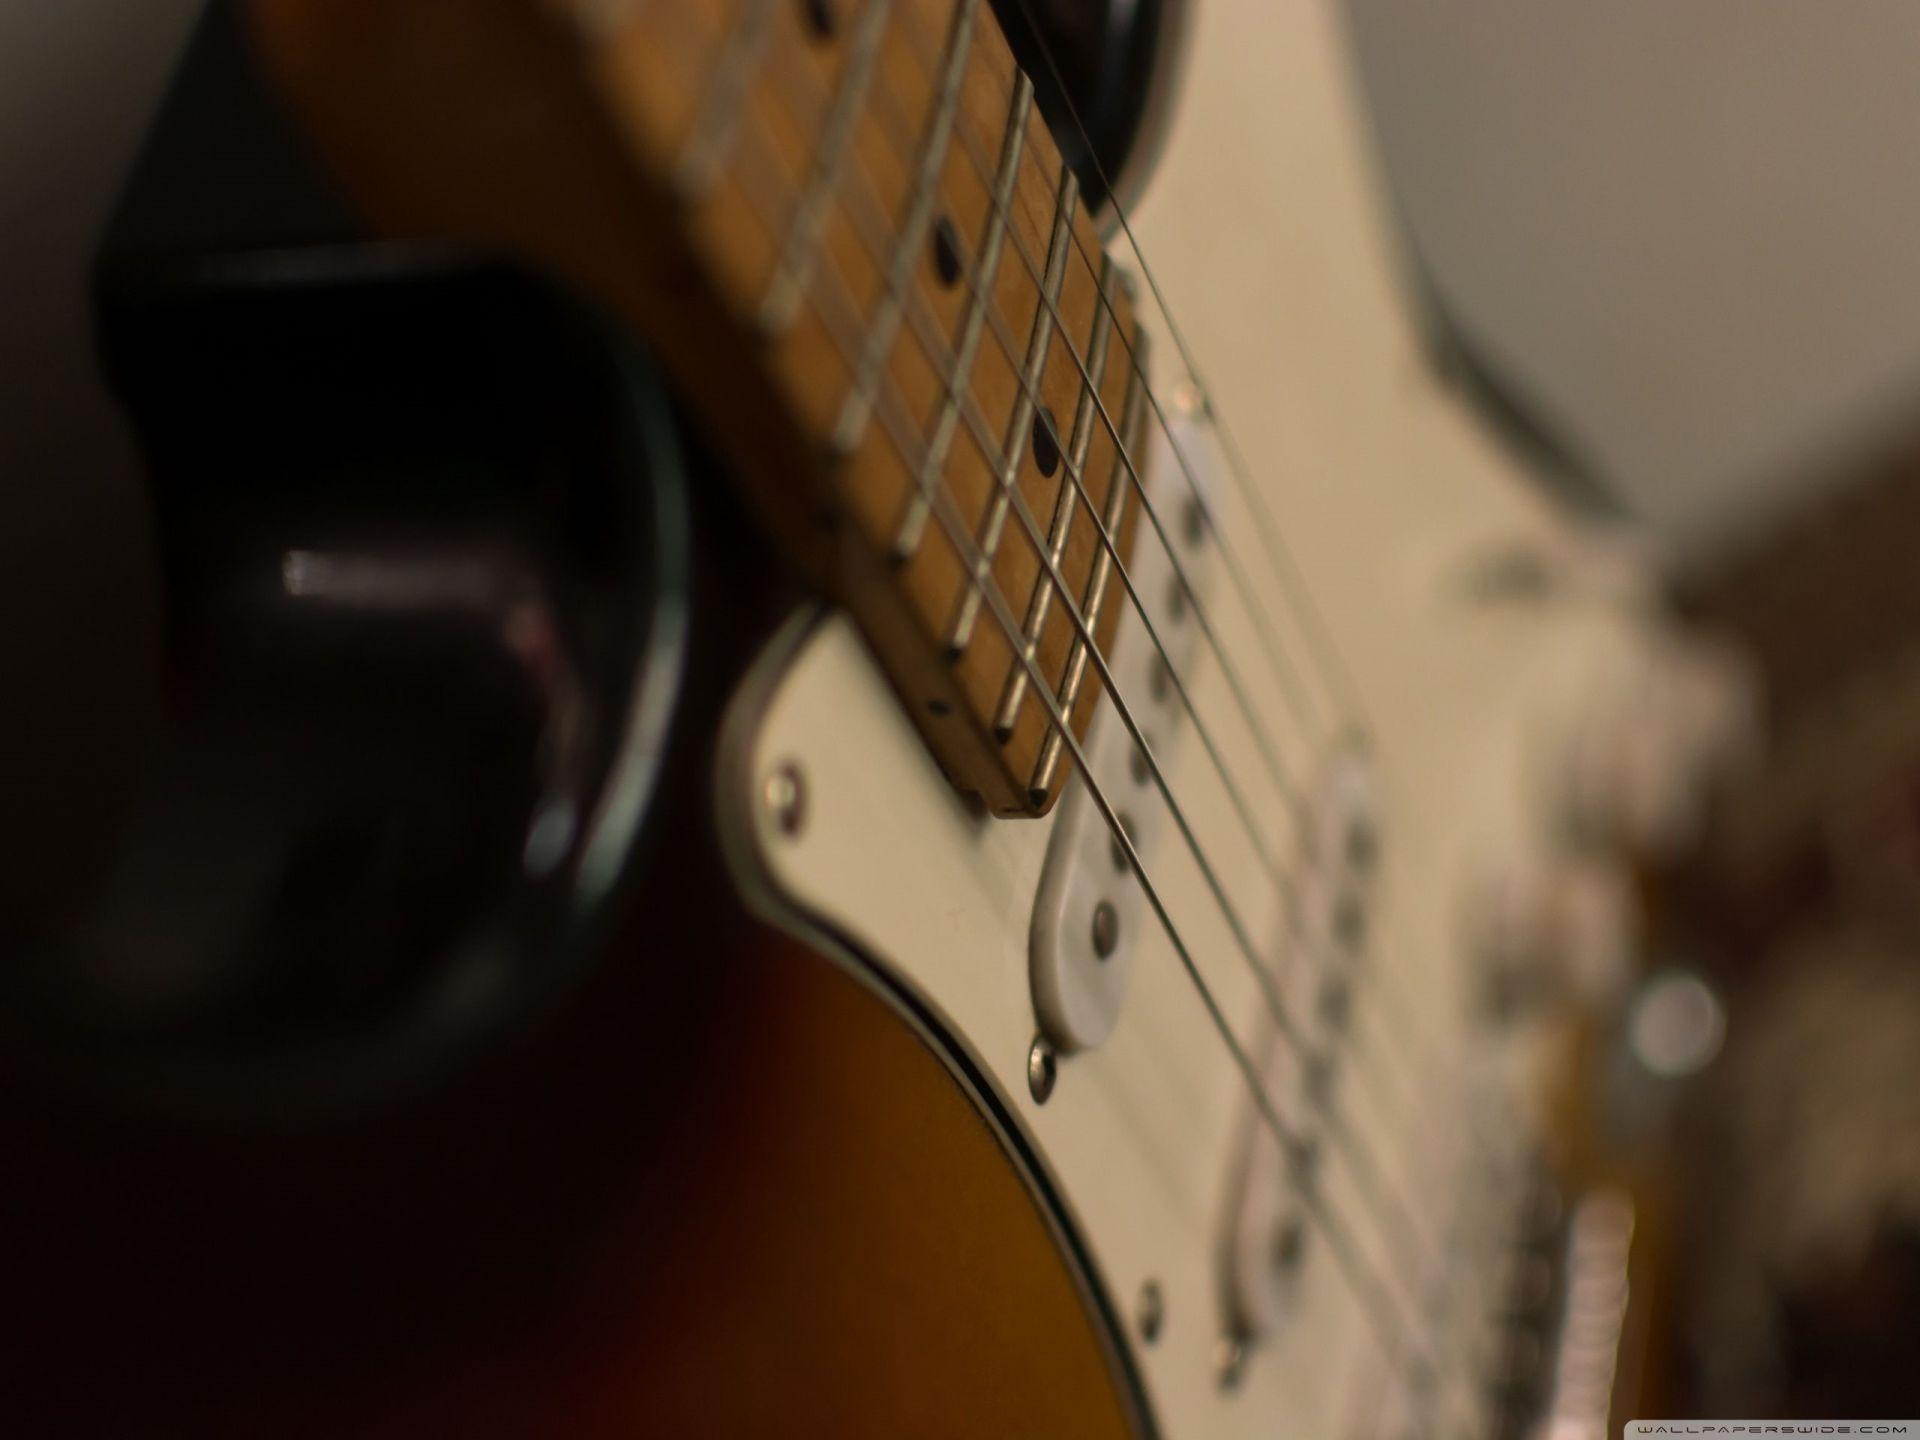 Fender Guitar, PC Wallpaper HD